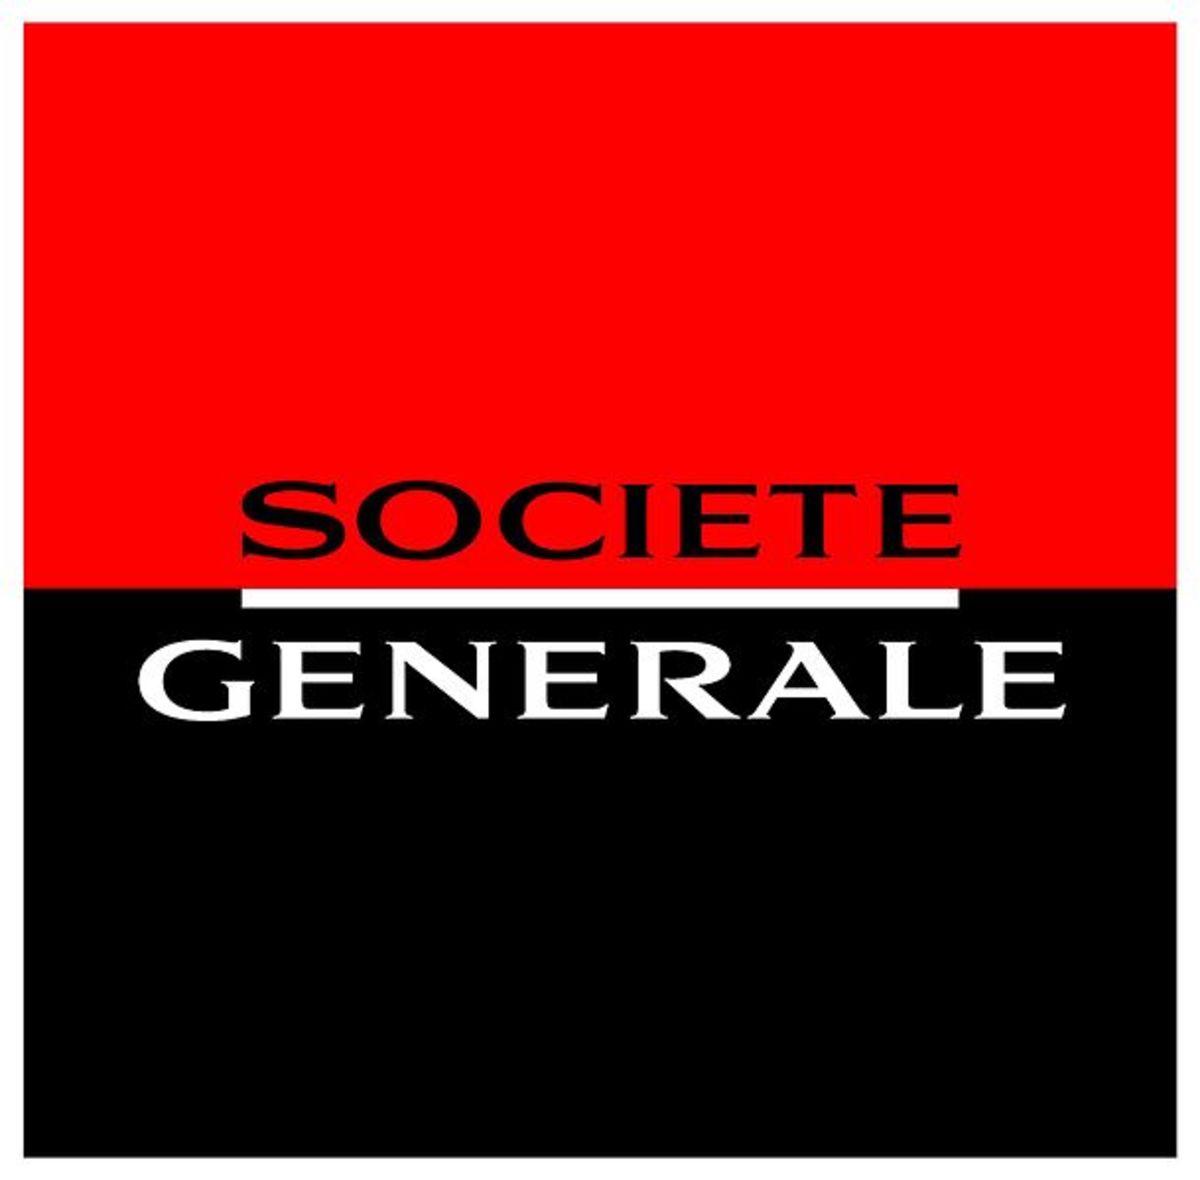 By Société Générale (Société Générale) [CC0], via Wikimedia Commons